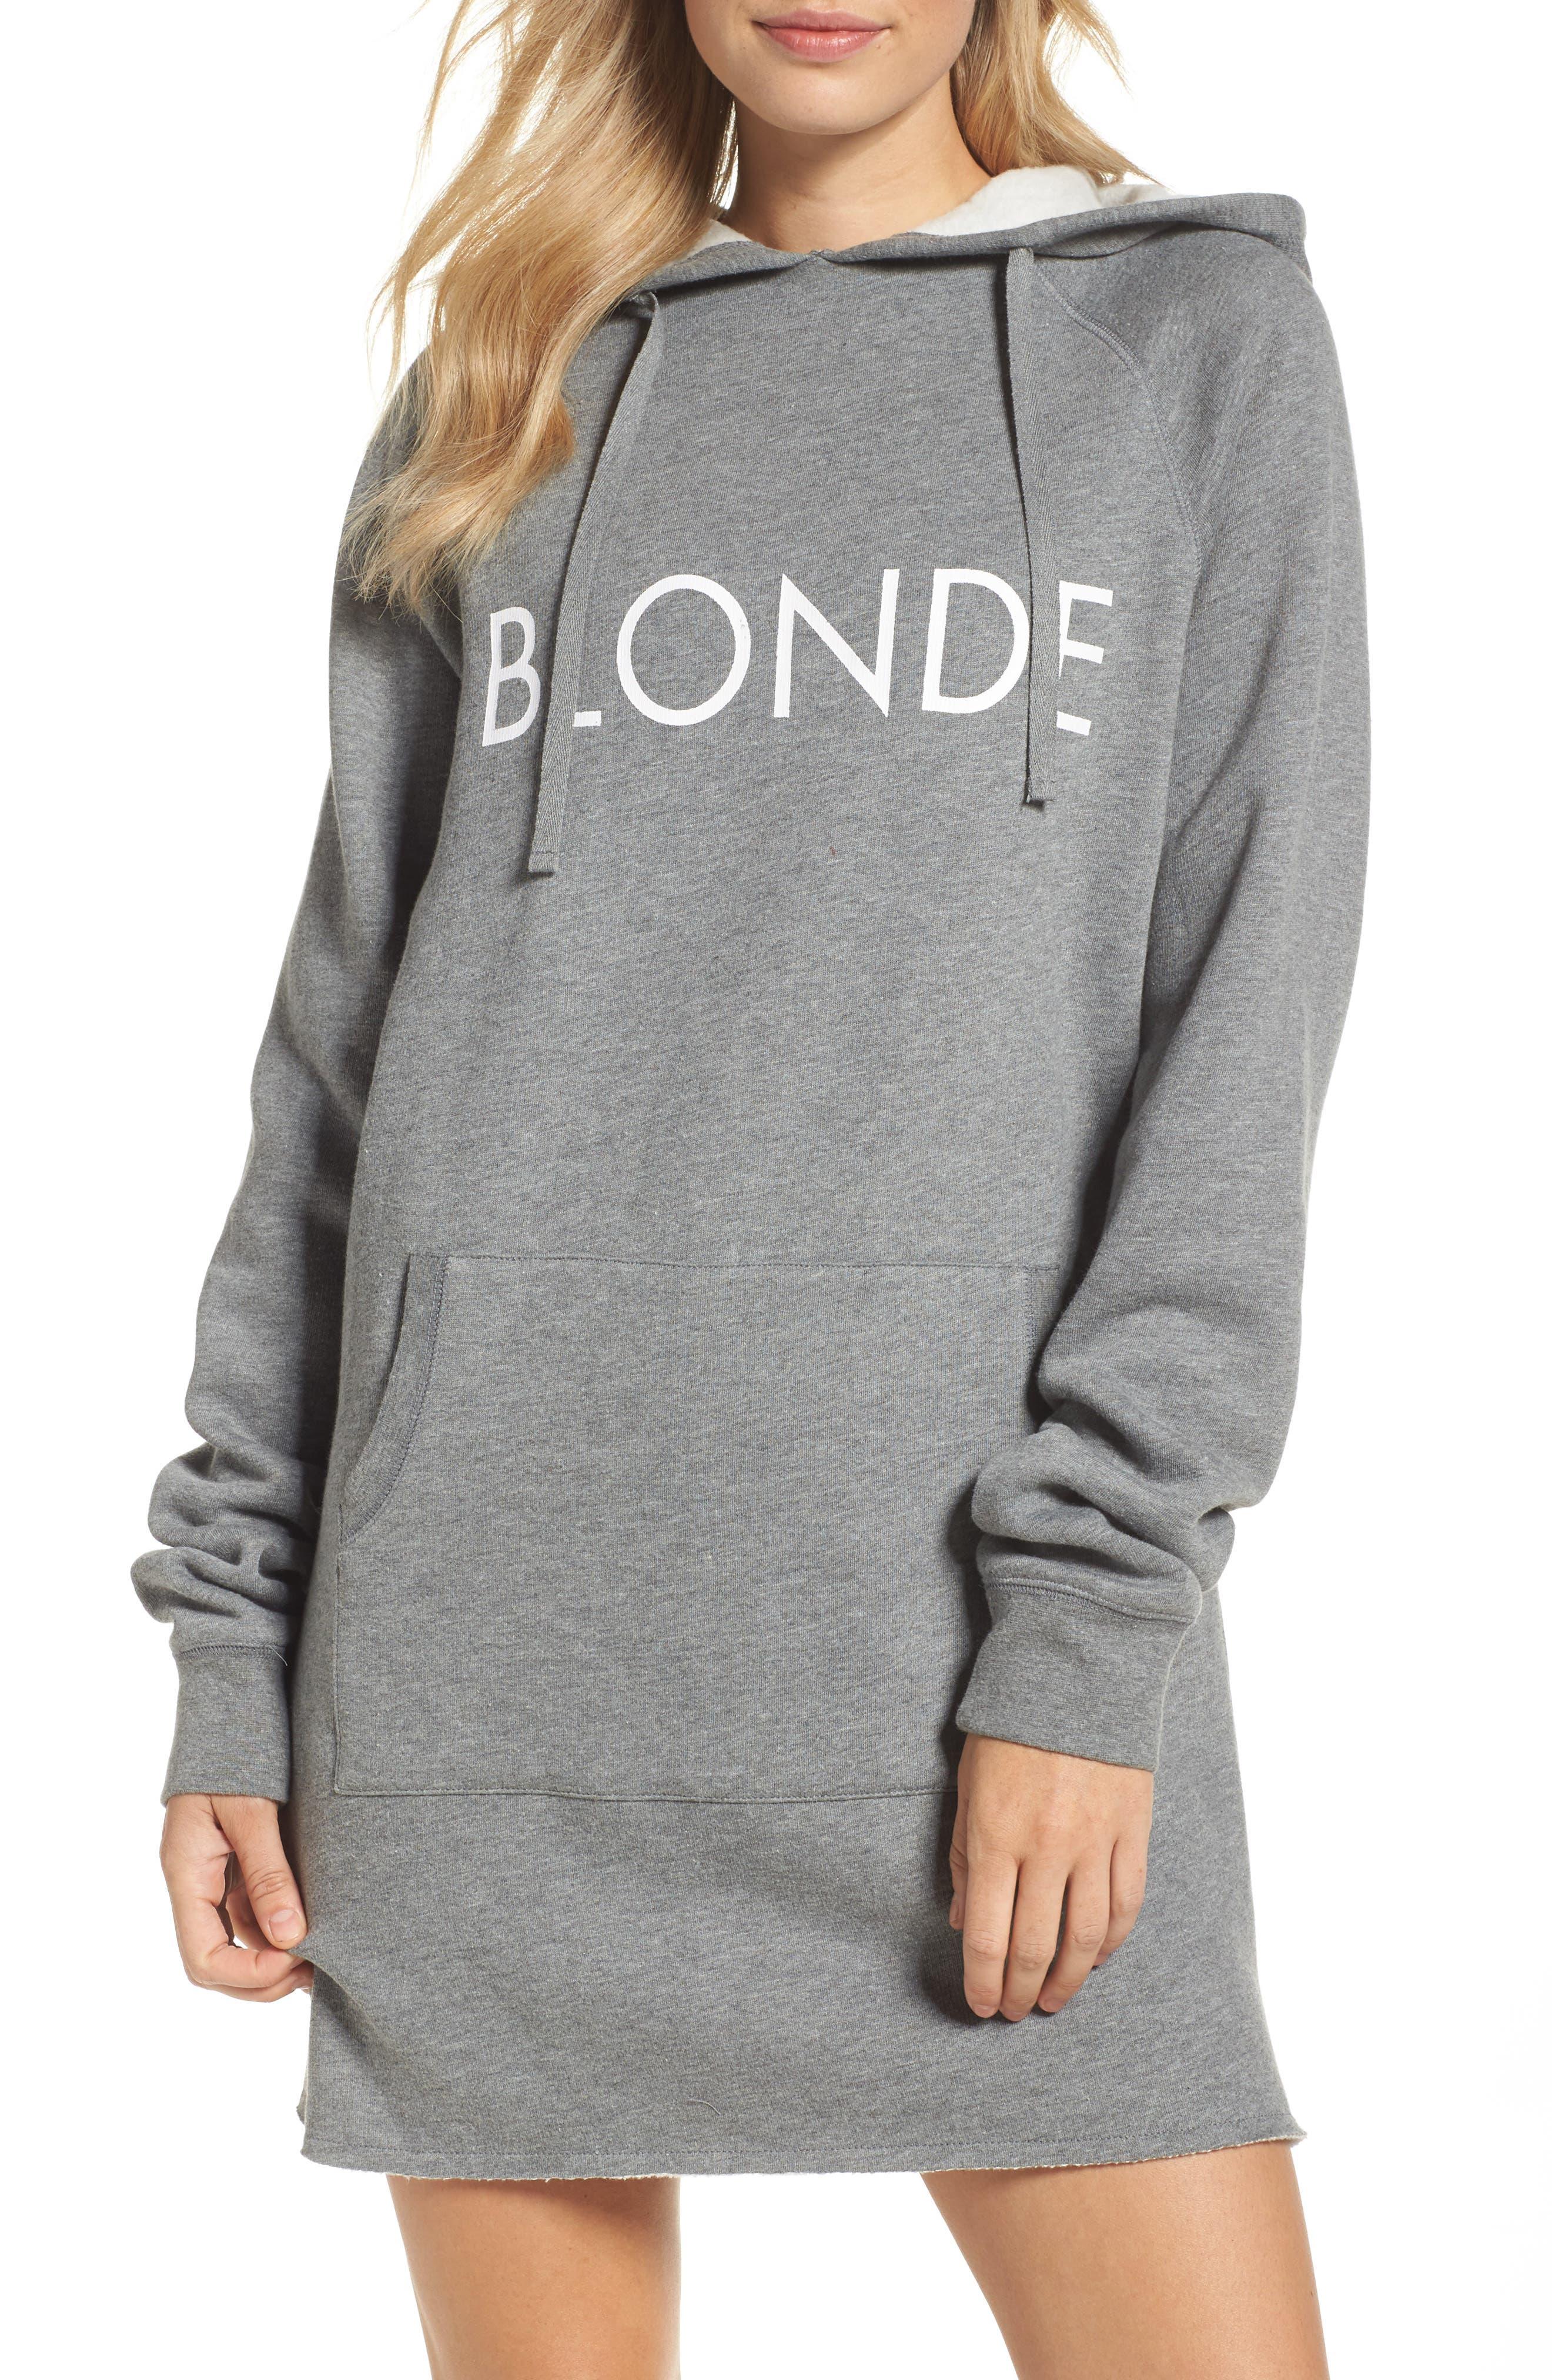 Blonde Sweatshirt Dress,                             Main thumbnail 1, color,                             Heather Grey White